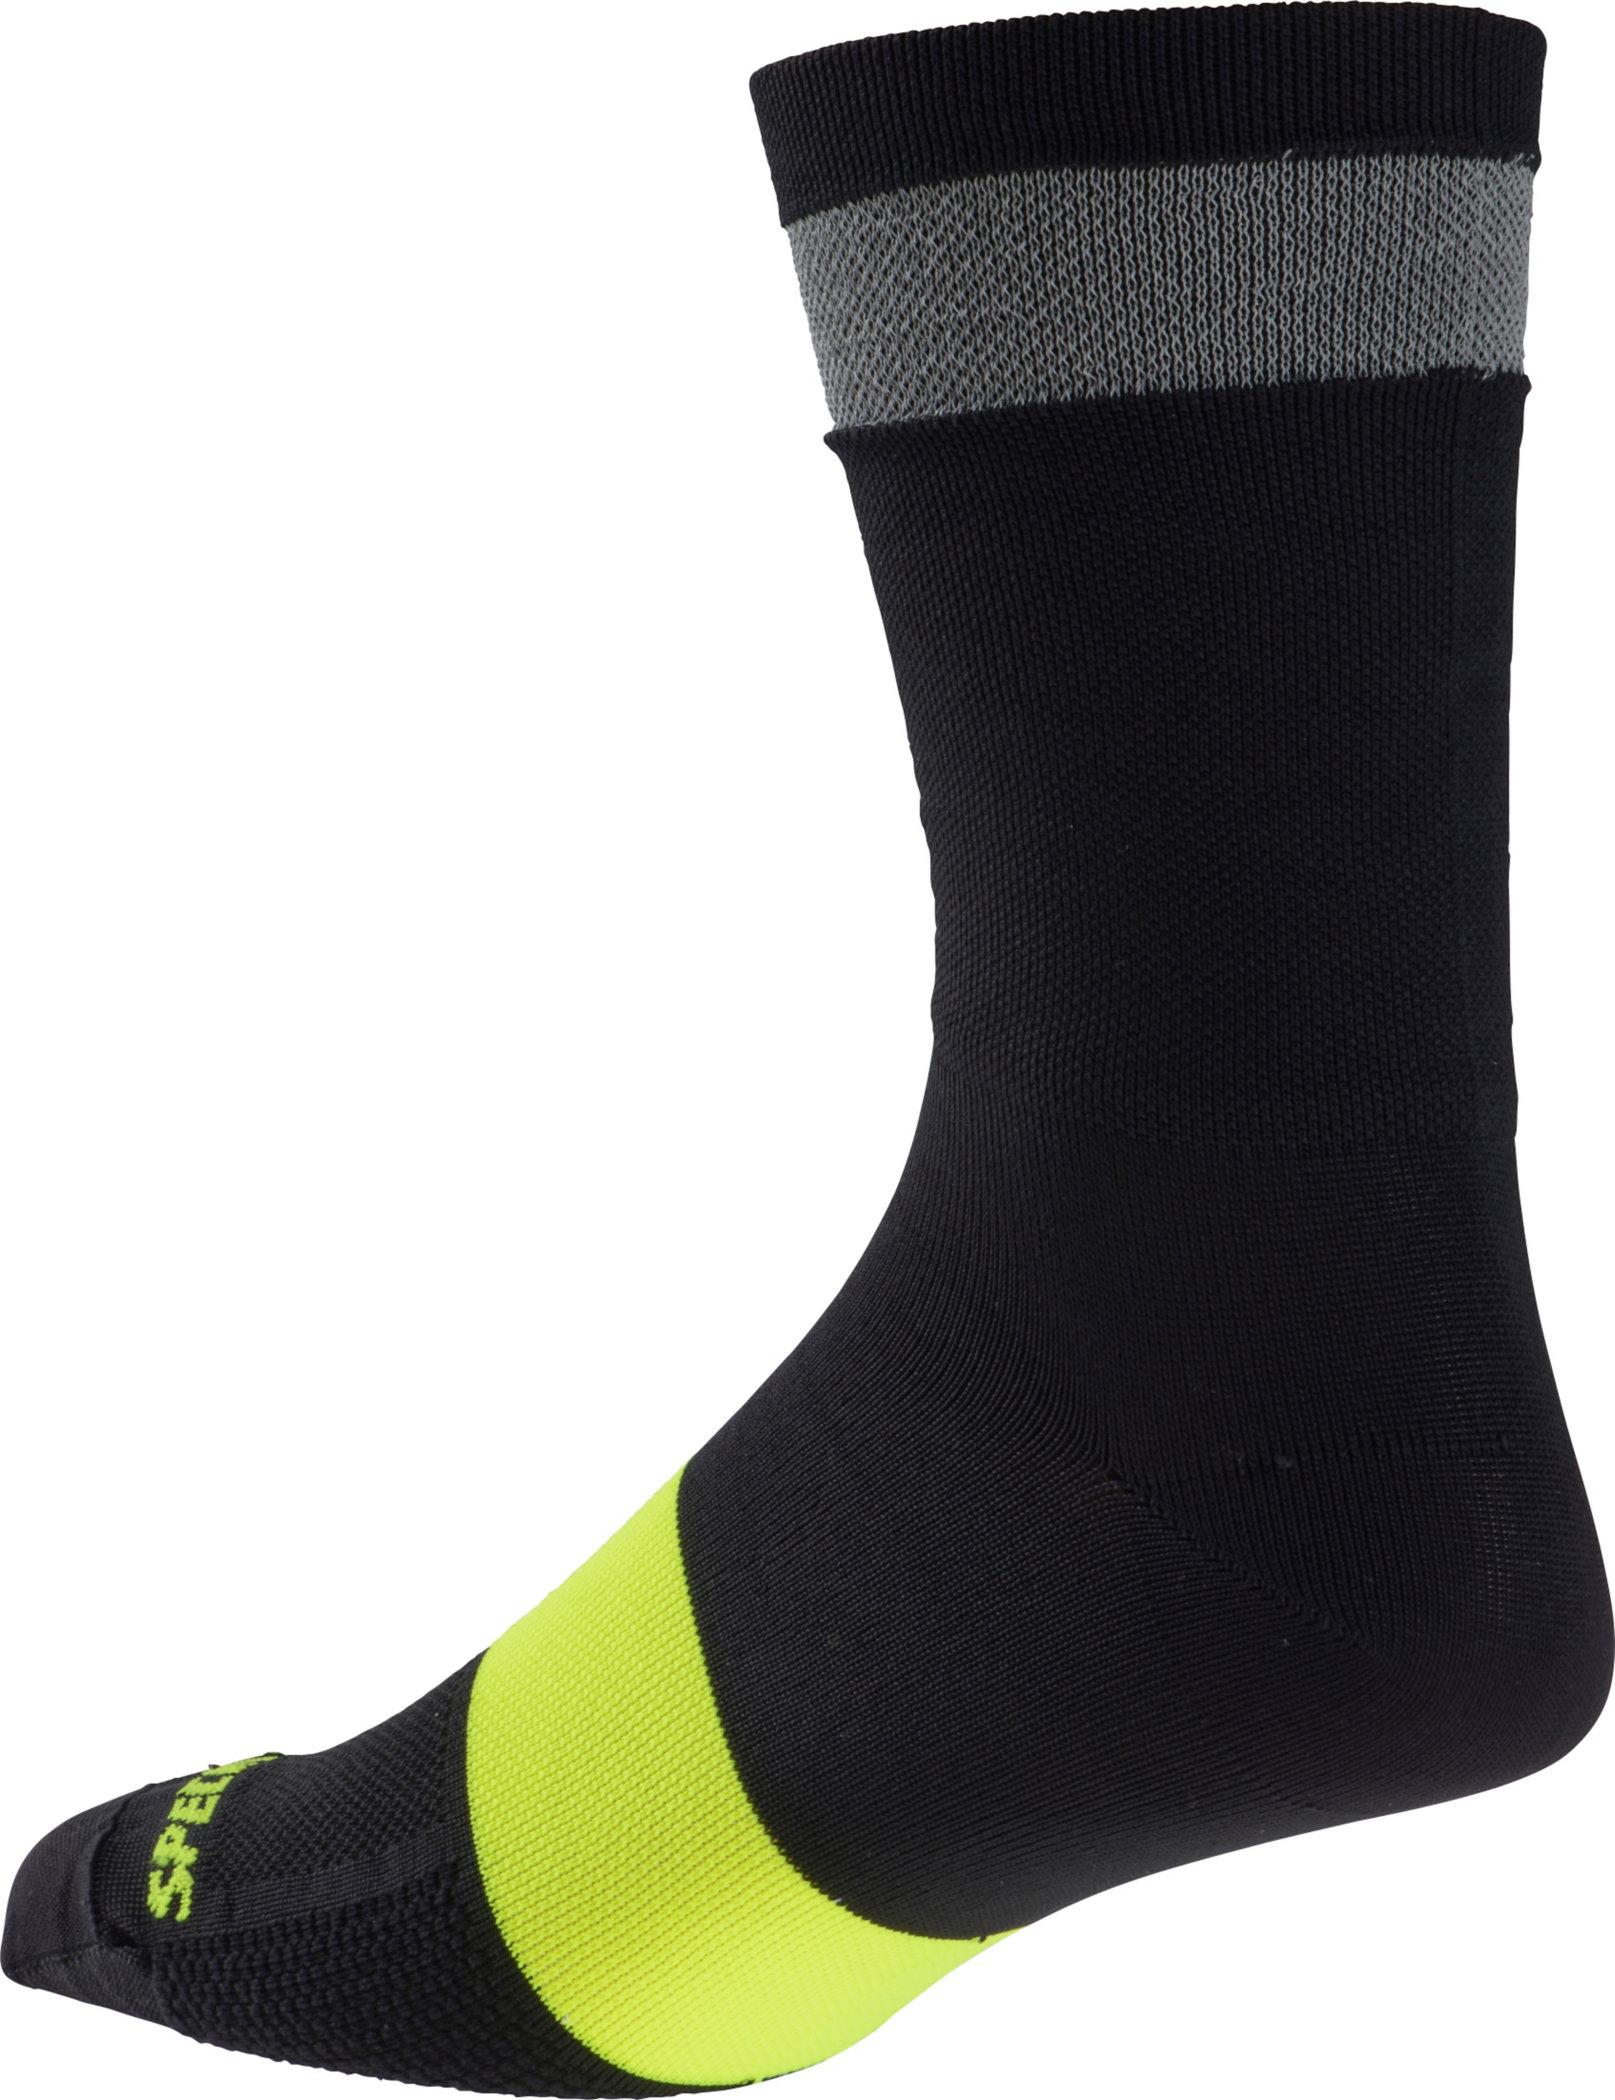 Specialized Women´s Reflect Tall Socks Black Medium/Large - Alpha Bikes